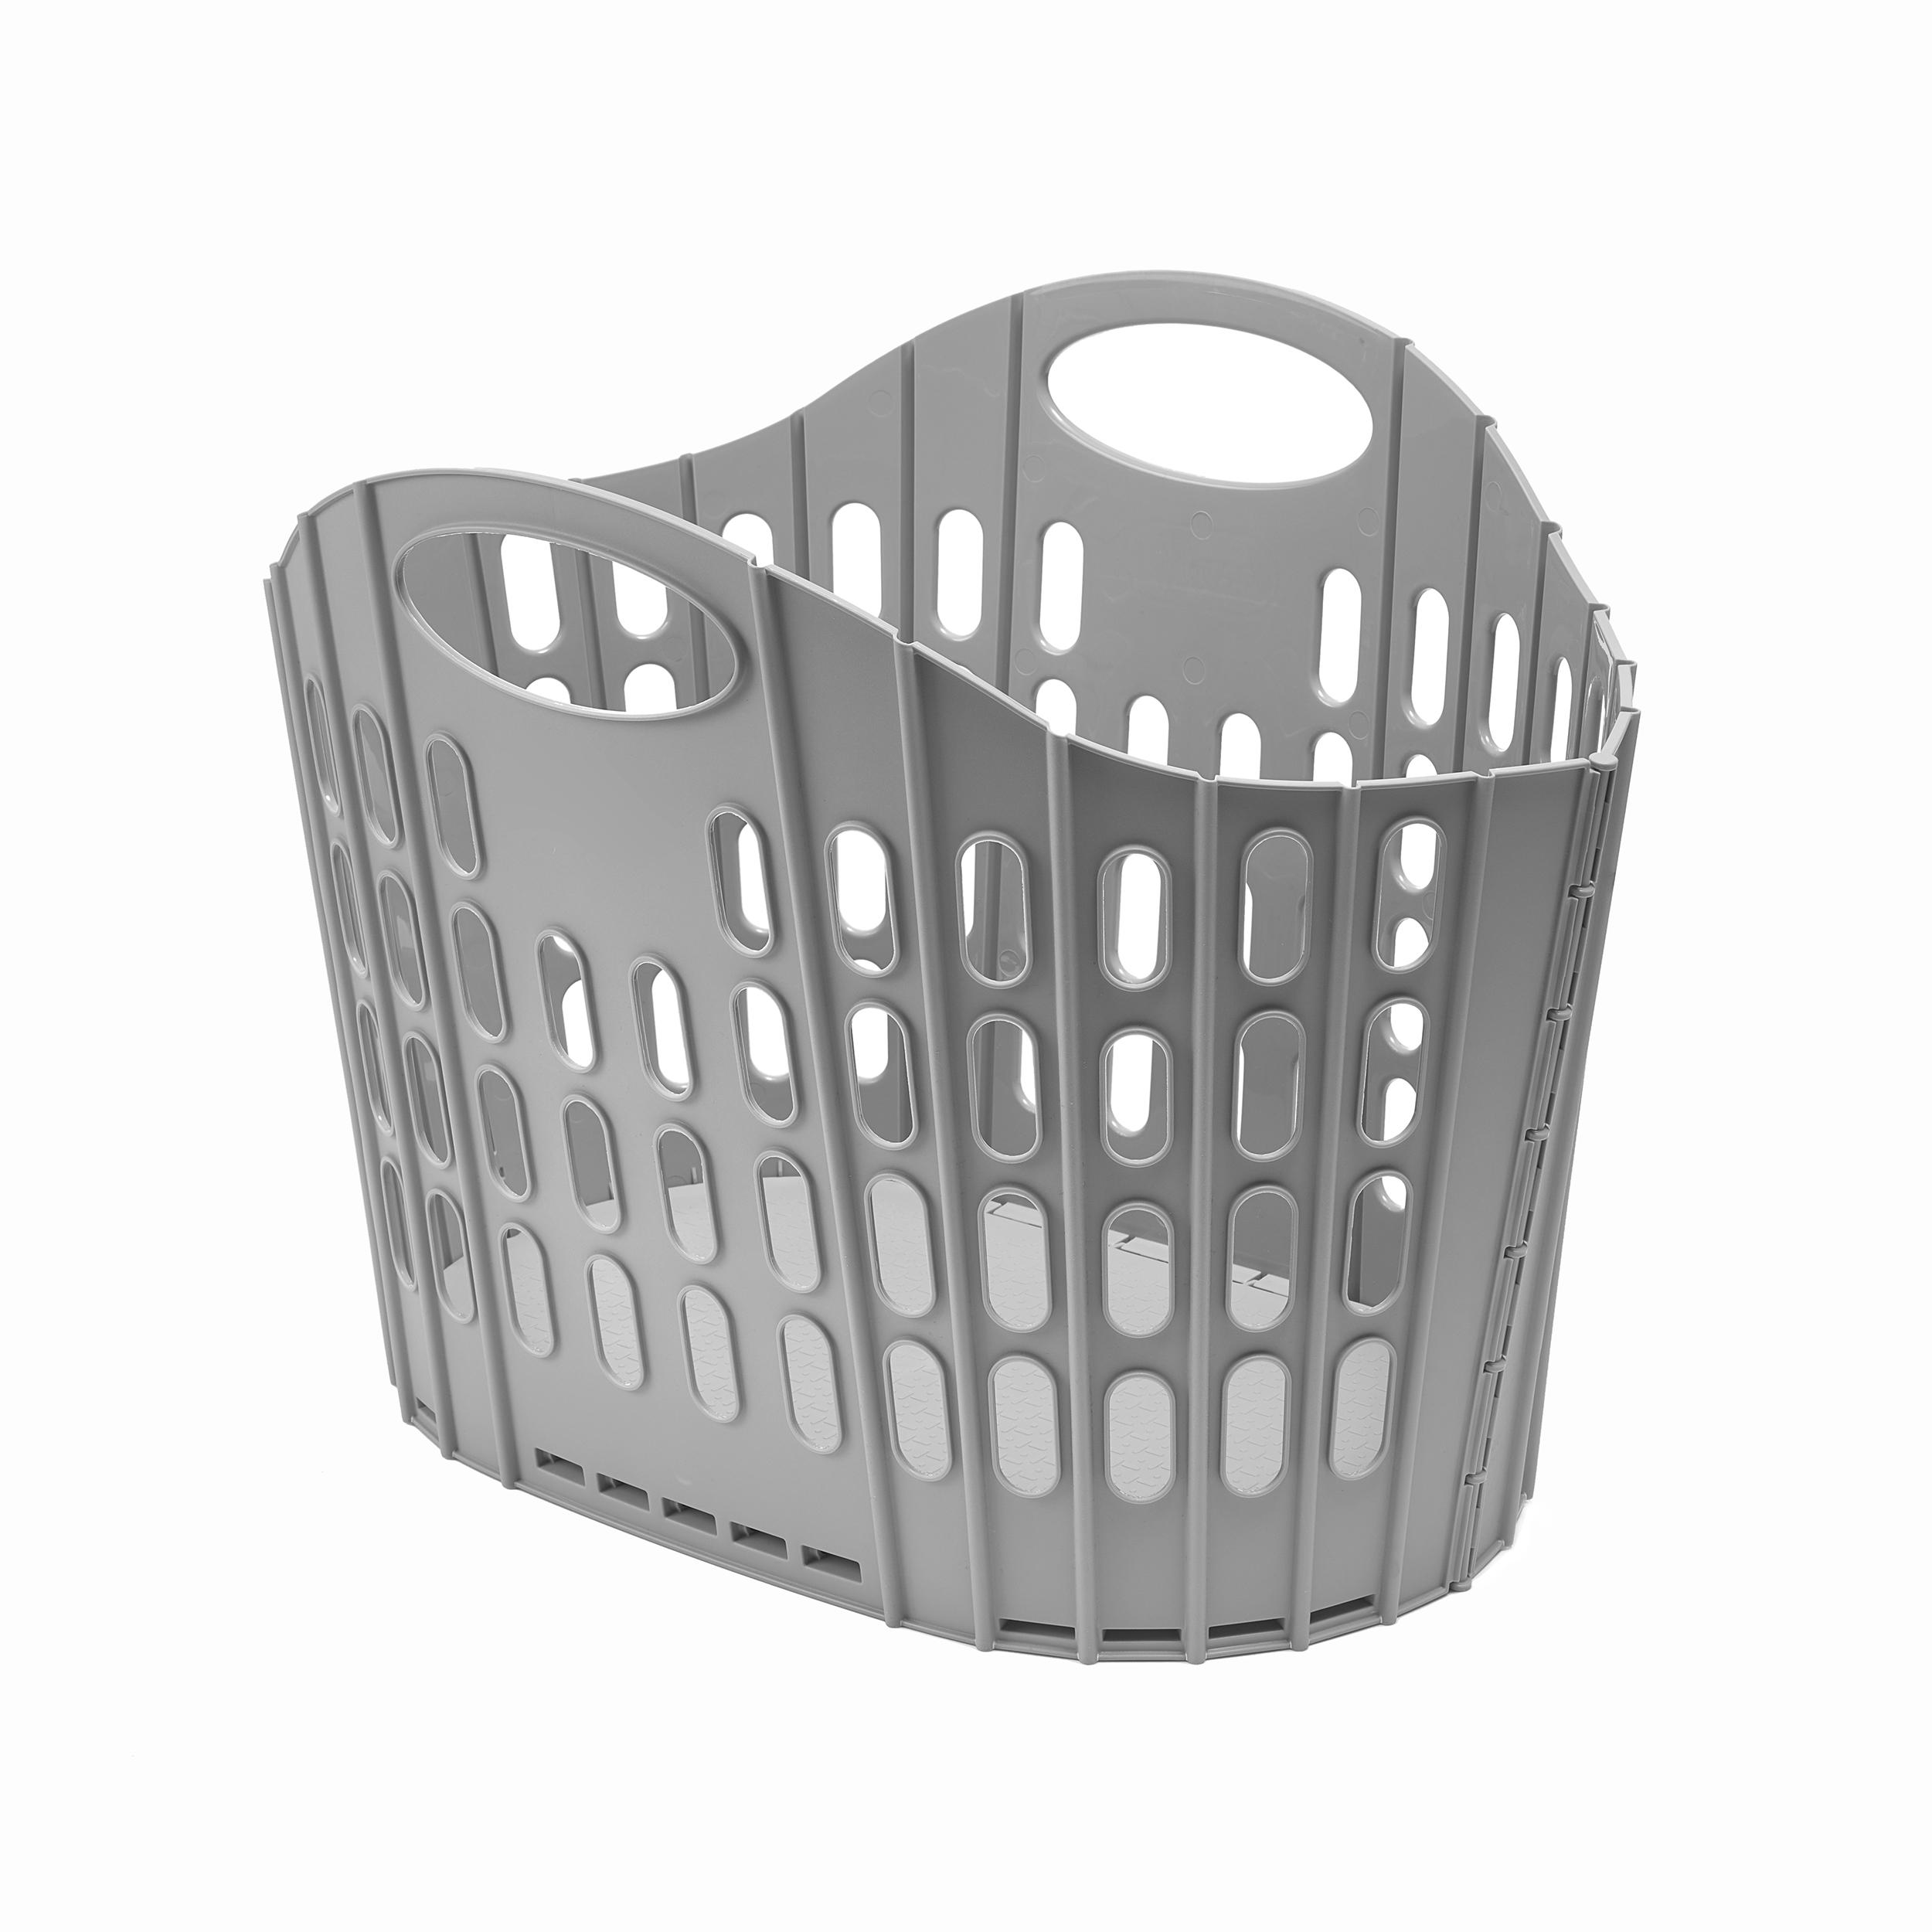 Image for Addis Fold Flat Large 38 Litre Laundry Basket Ref 518163